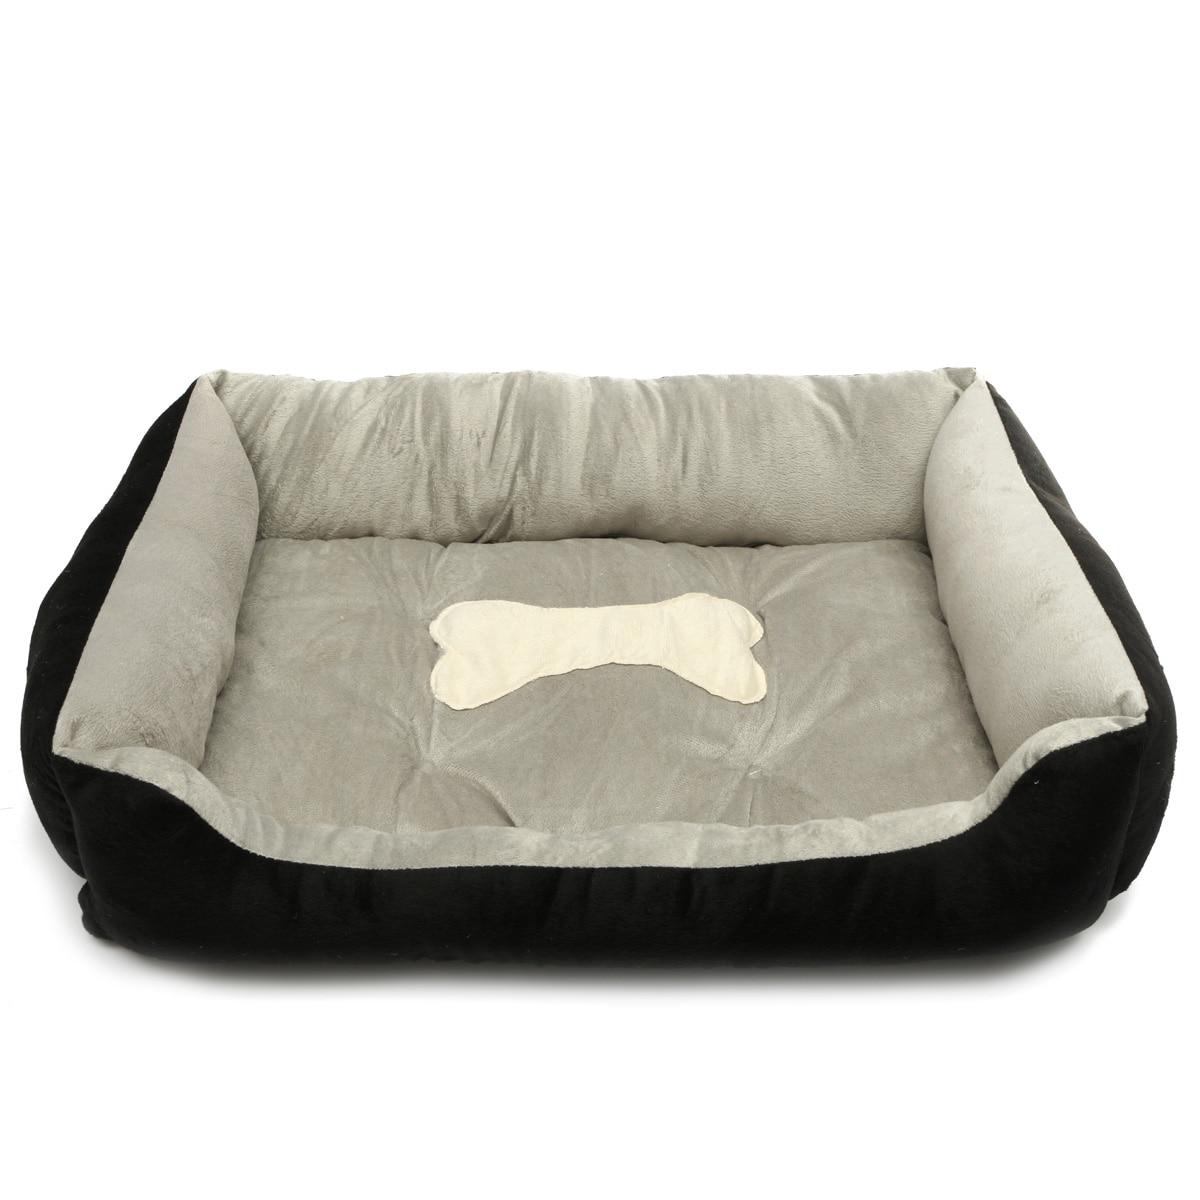 Bed For Dogs Warm Flannel Warm Waterproof Bottom Soft Fleece Warm Cat House Petshop Puppy Mats Kennel Play Rest Sleep Cushion 13